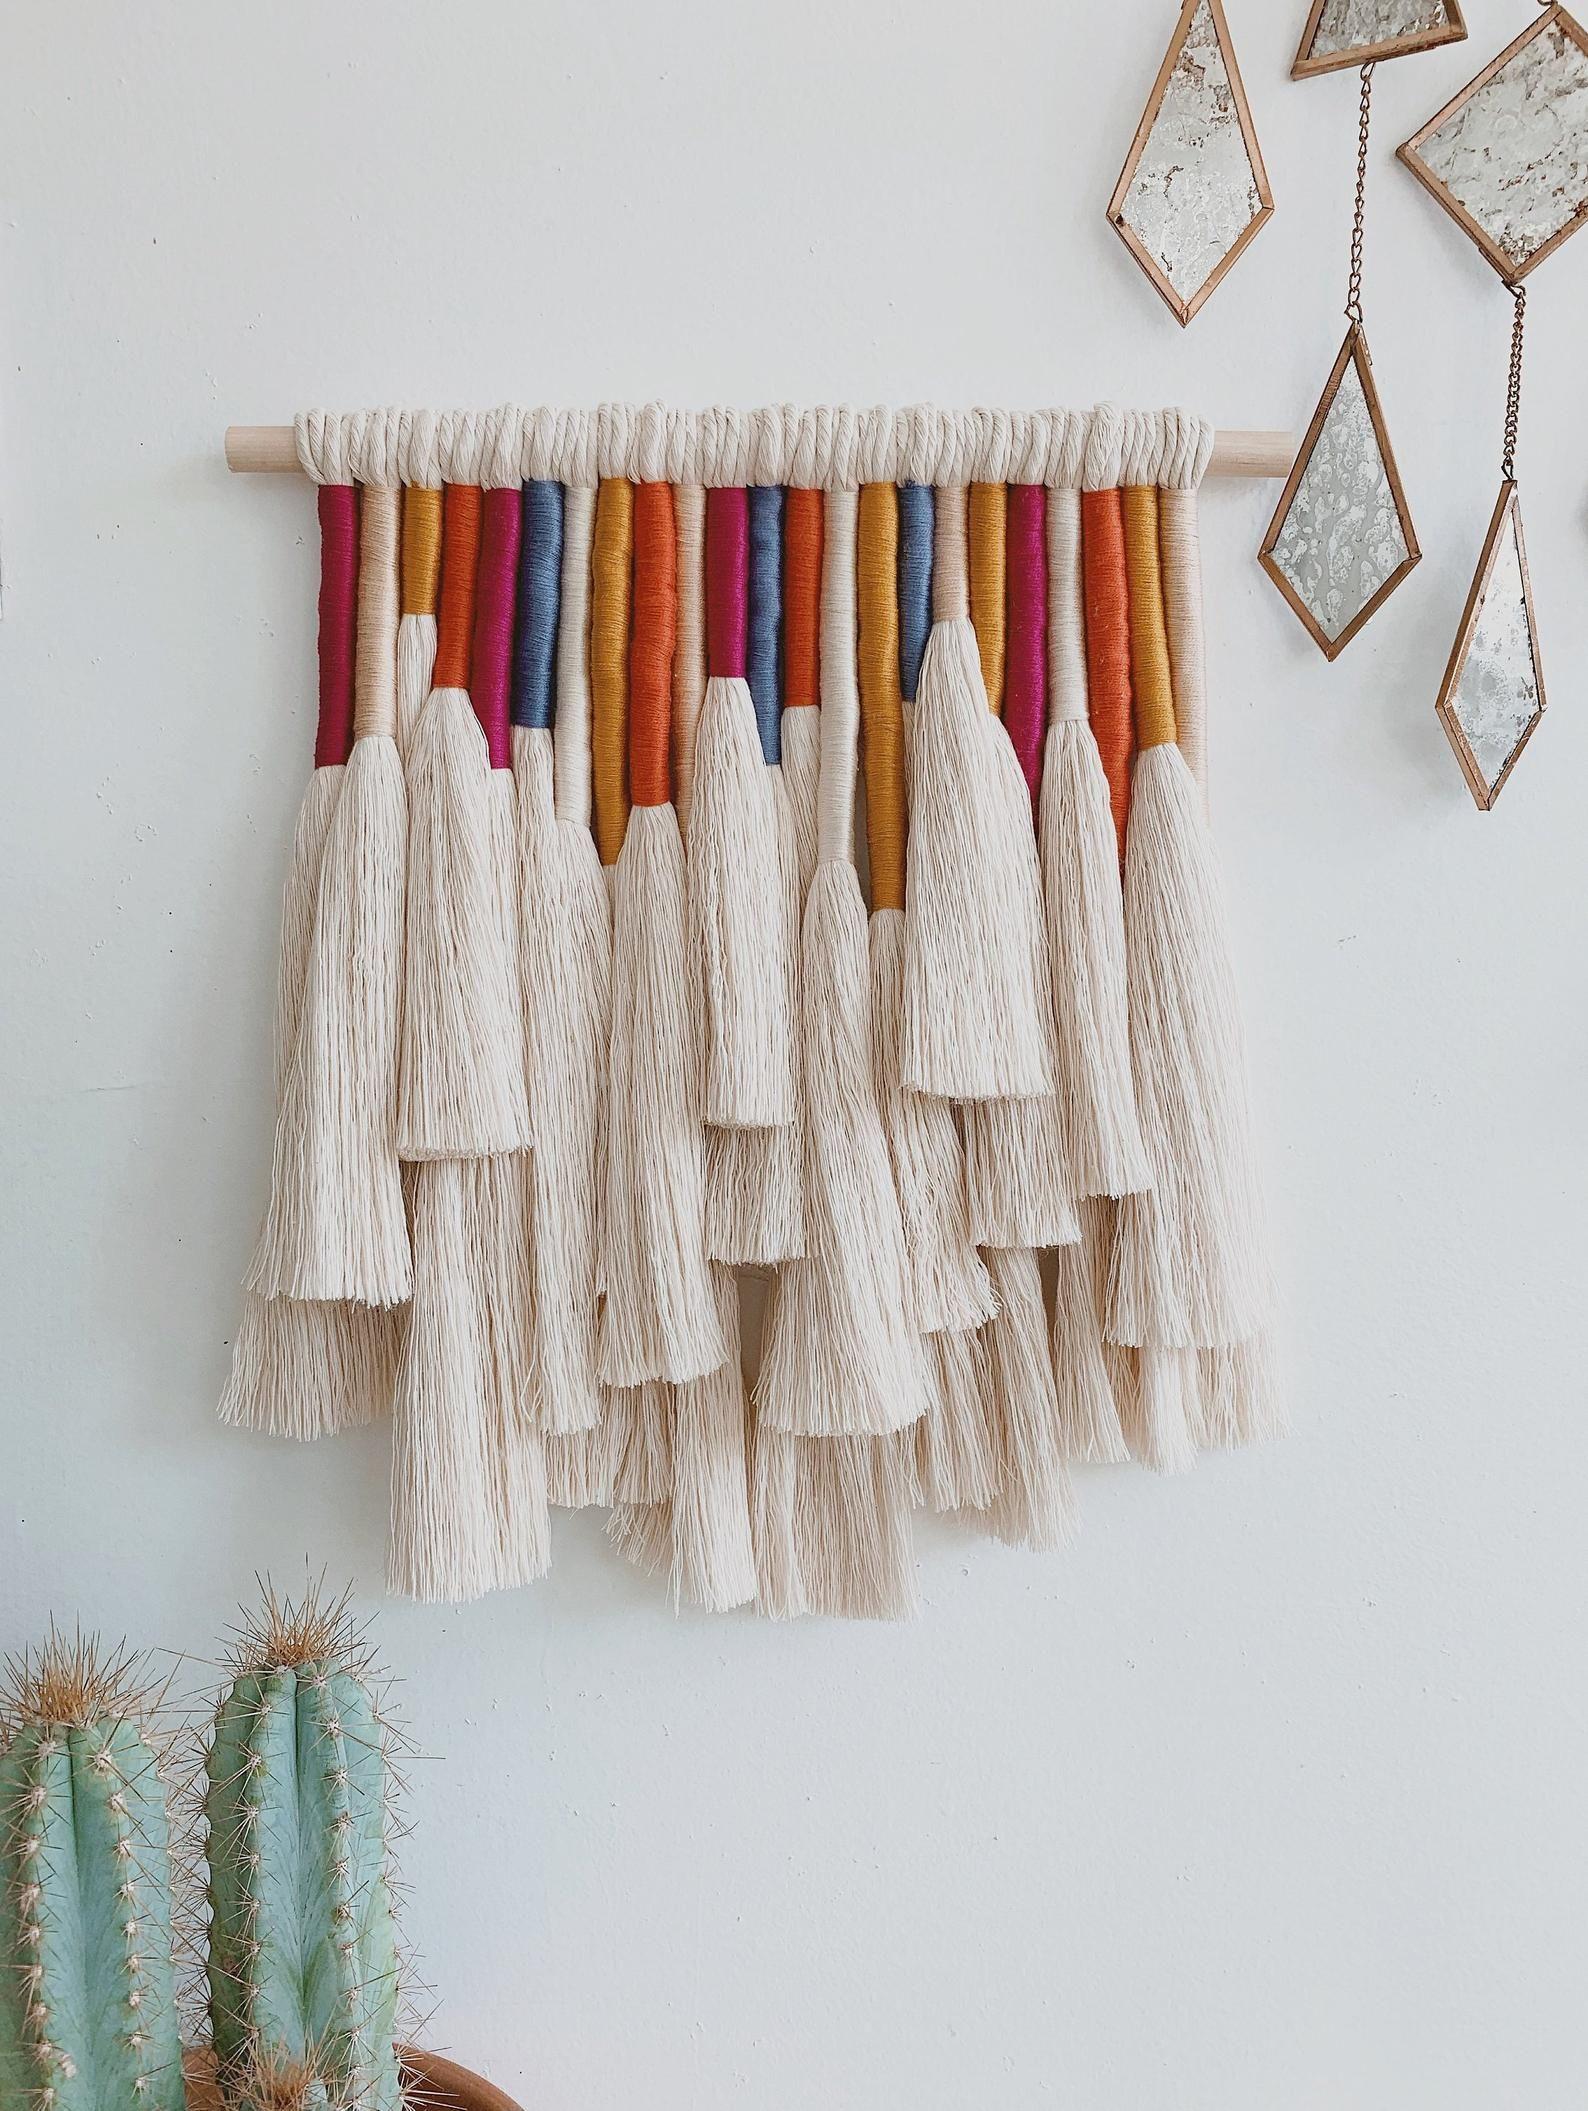 Mariposa Macrame Wall Hanging Etsy Yarn Wall Hanging Yarn Wall Art Macrame Wall Hanging